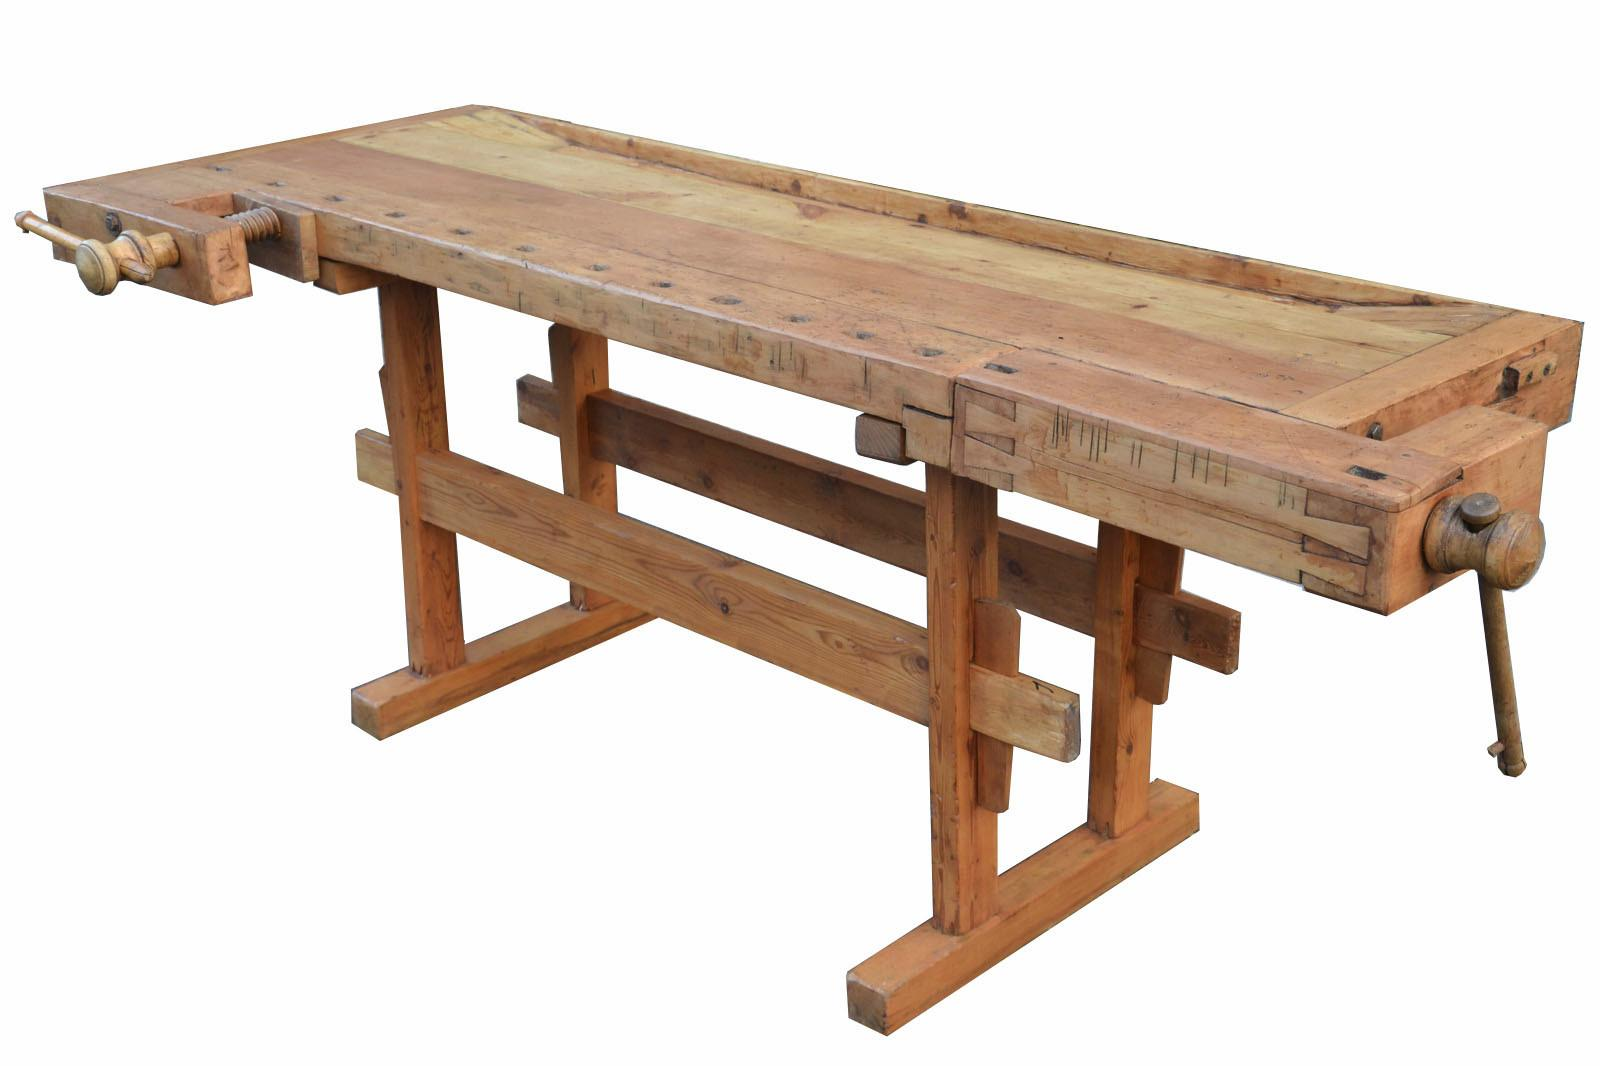 vecchio-tavolo-da-falegname-in-legno-6,3101.jpg?WebbinsCacheCounter=1